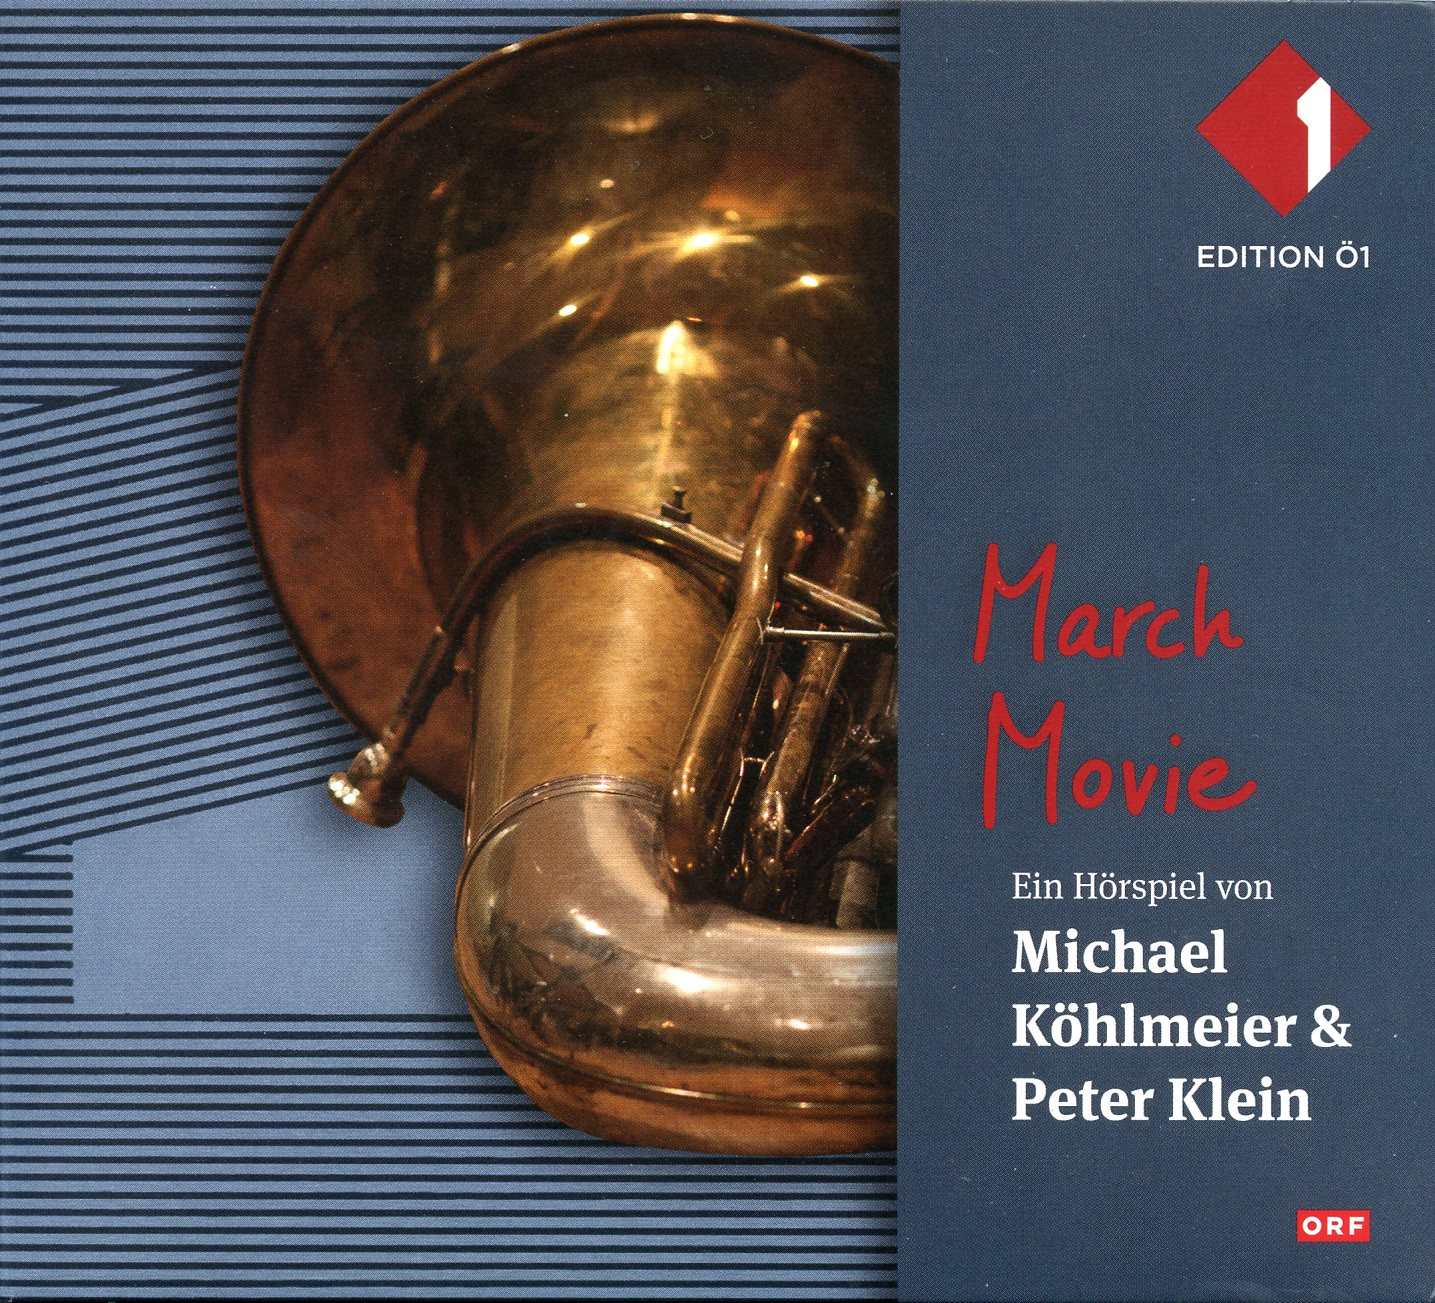 March Movie (Peter Klein, Michael Köhlmeier) ORF 1983